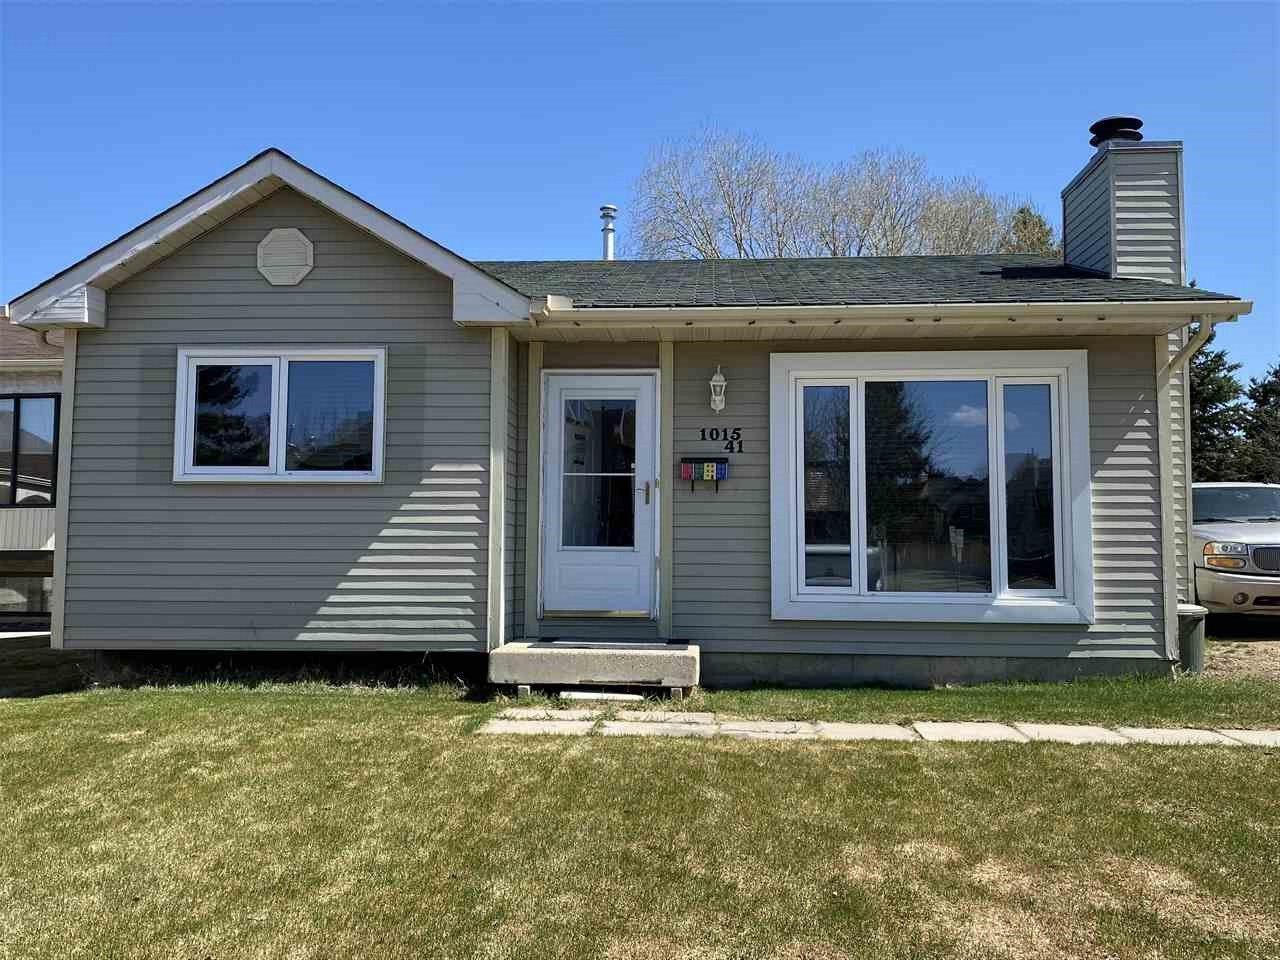 Main Photo: 1015 41 Street in Edmonton: Zone 29 House for sale : MLS®# E4192627